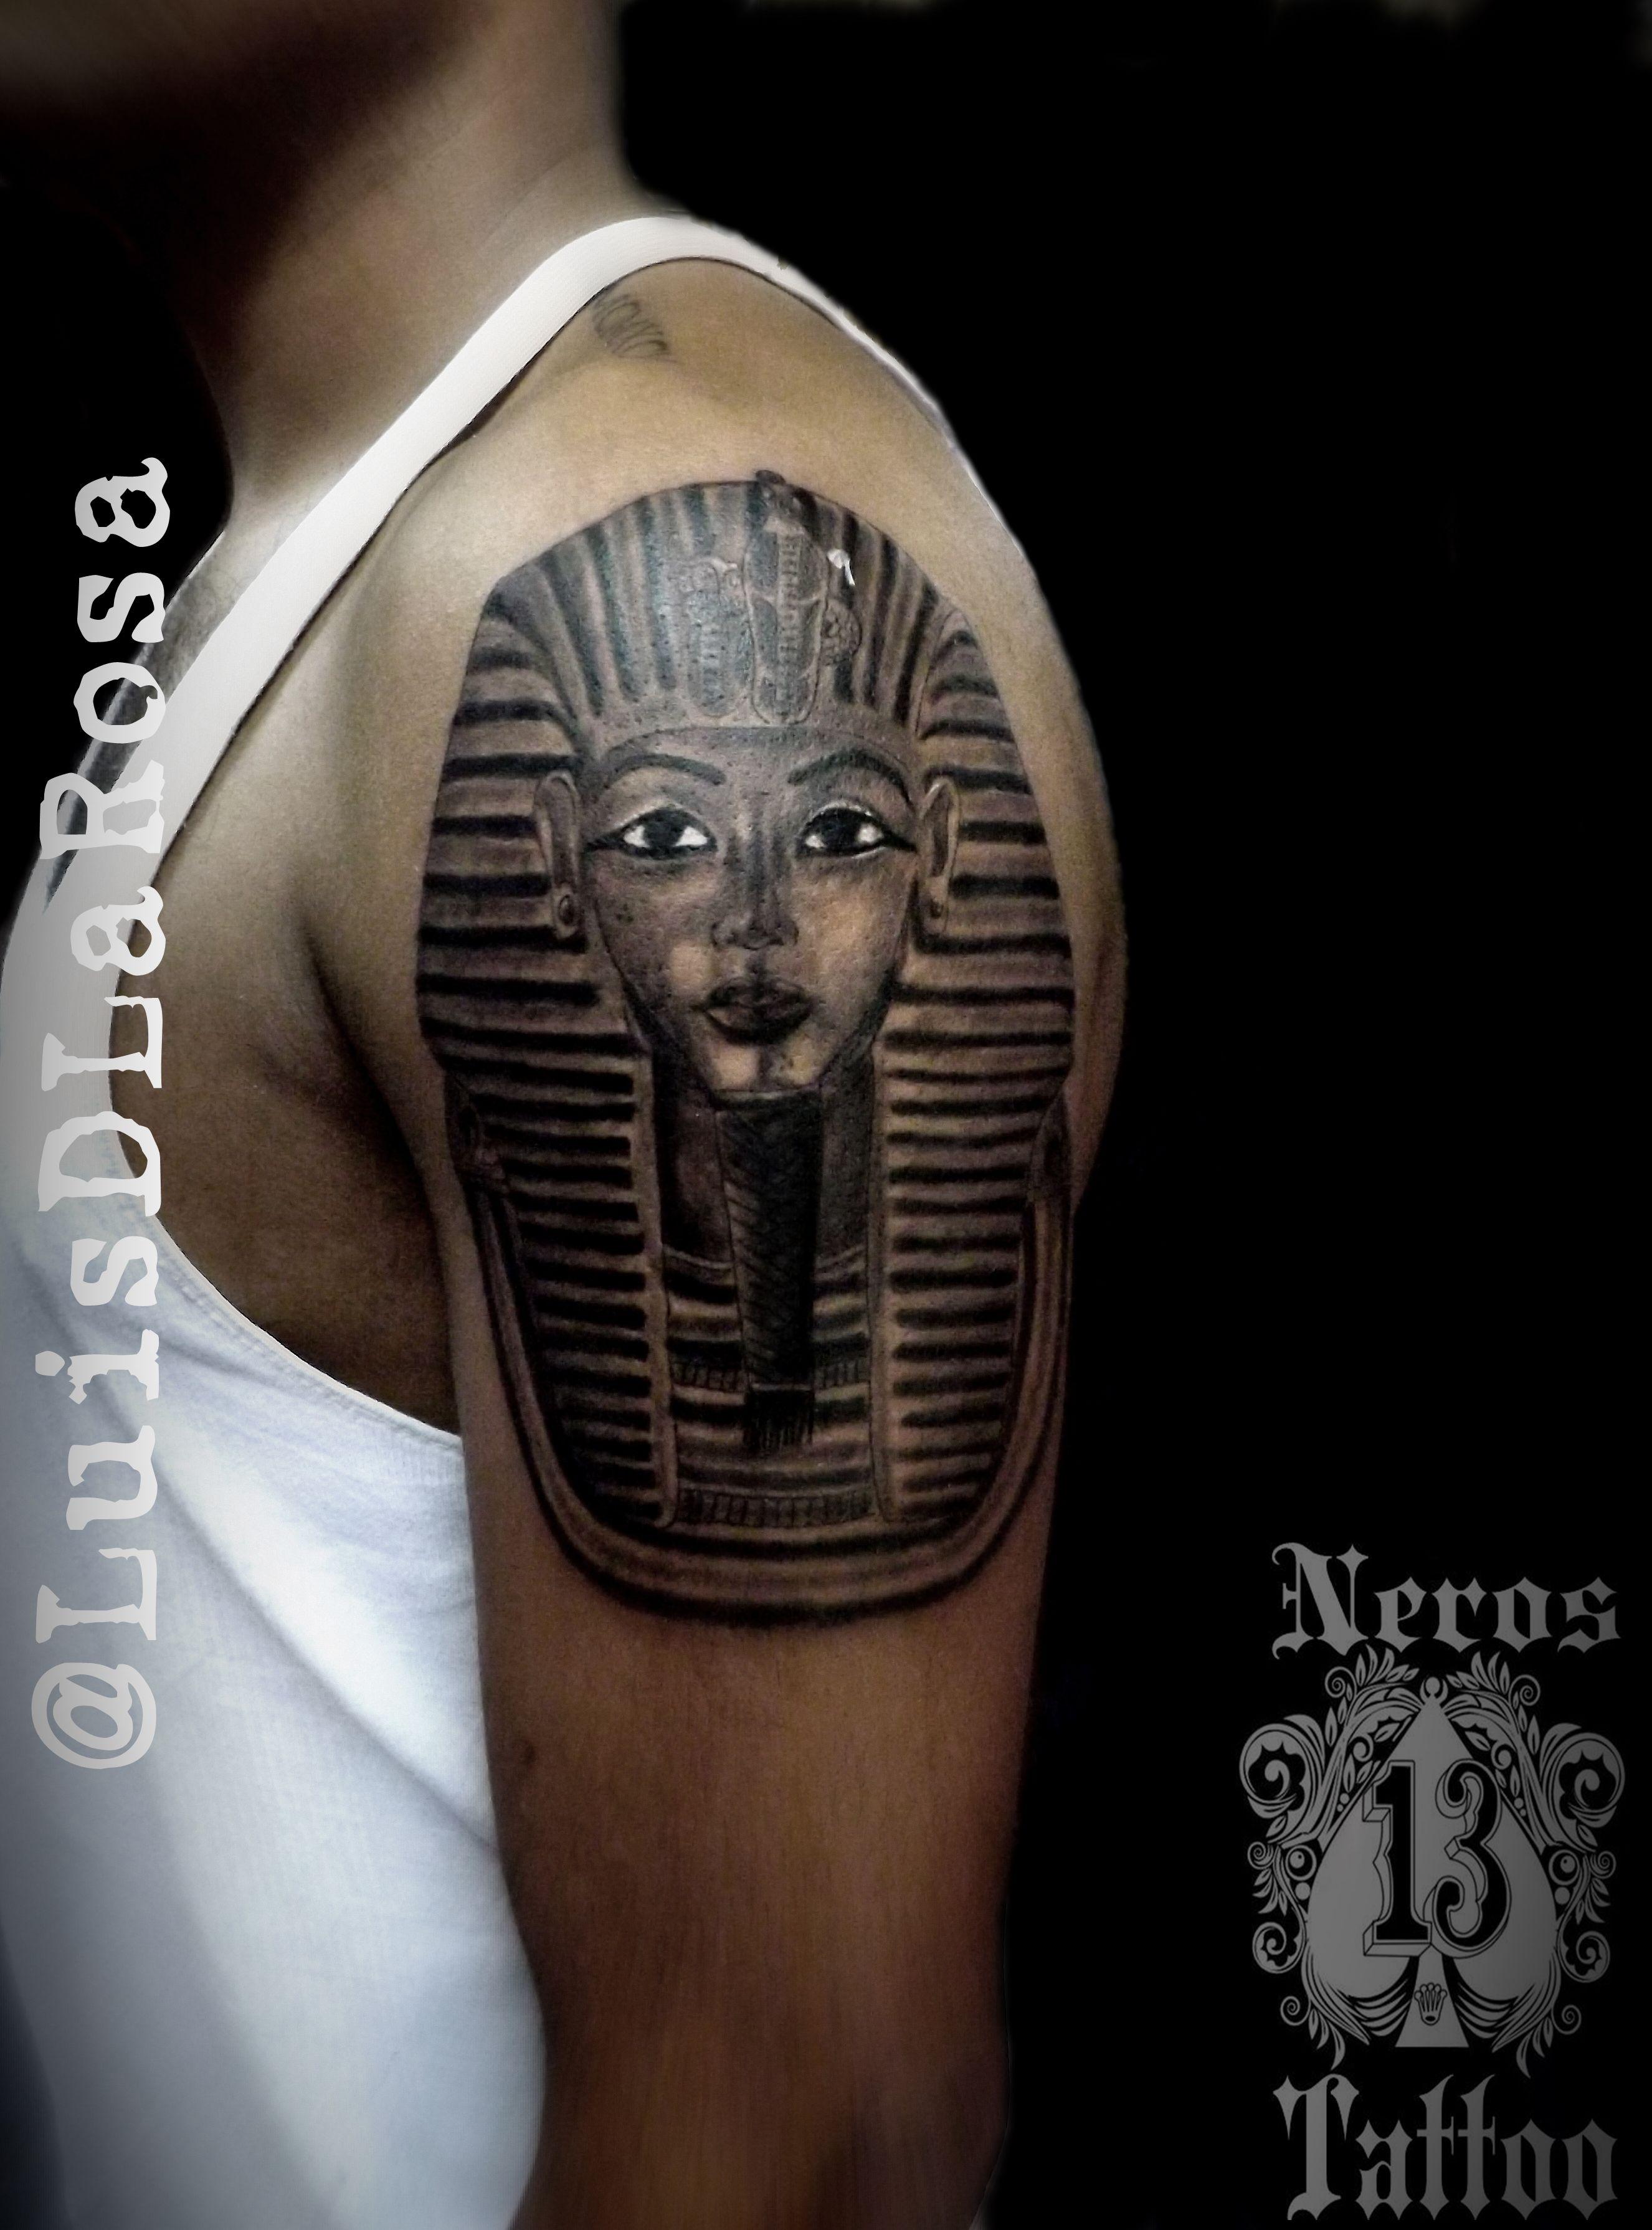 #faraontattoo #egiptattoo #armtattoo #perutatto #luisdlarosa #nerostattoo #perutattoo #peruart #artperu #peruartist